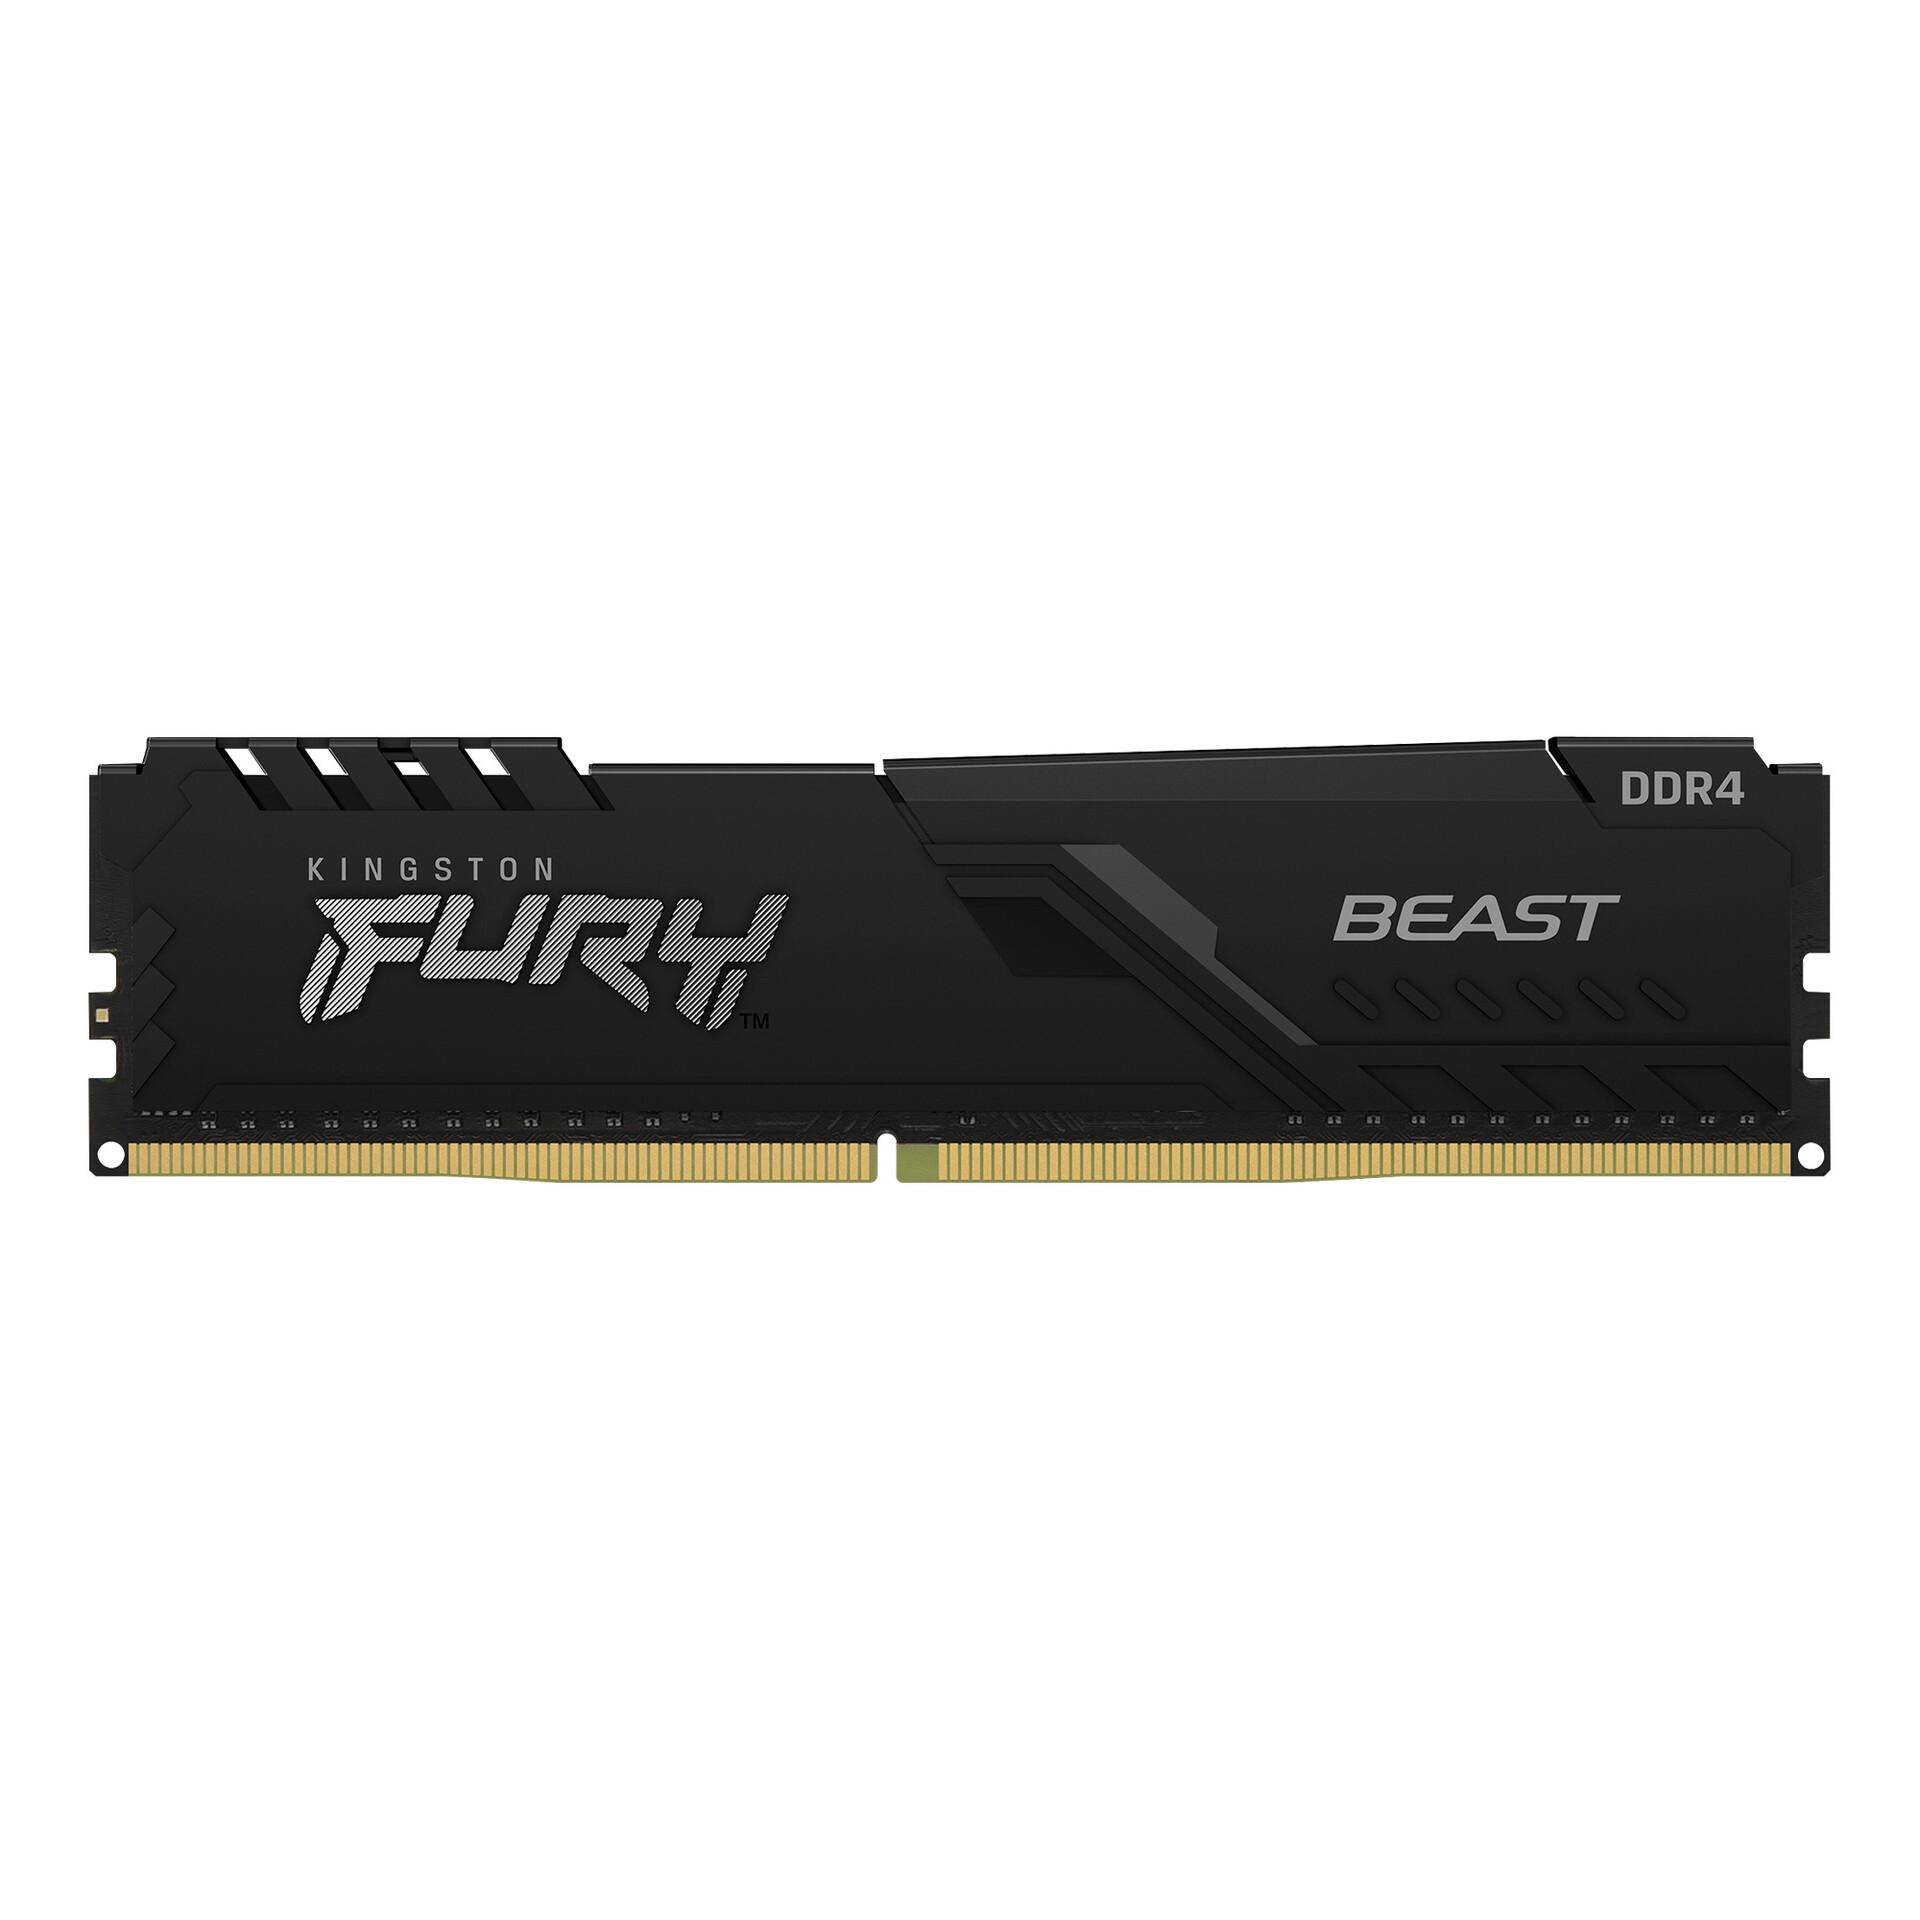 KINGSTON - KINGSTON - 16GB 3200MHz DDR4 CL16 DIMM 1Gx8 FURY Beast Black